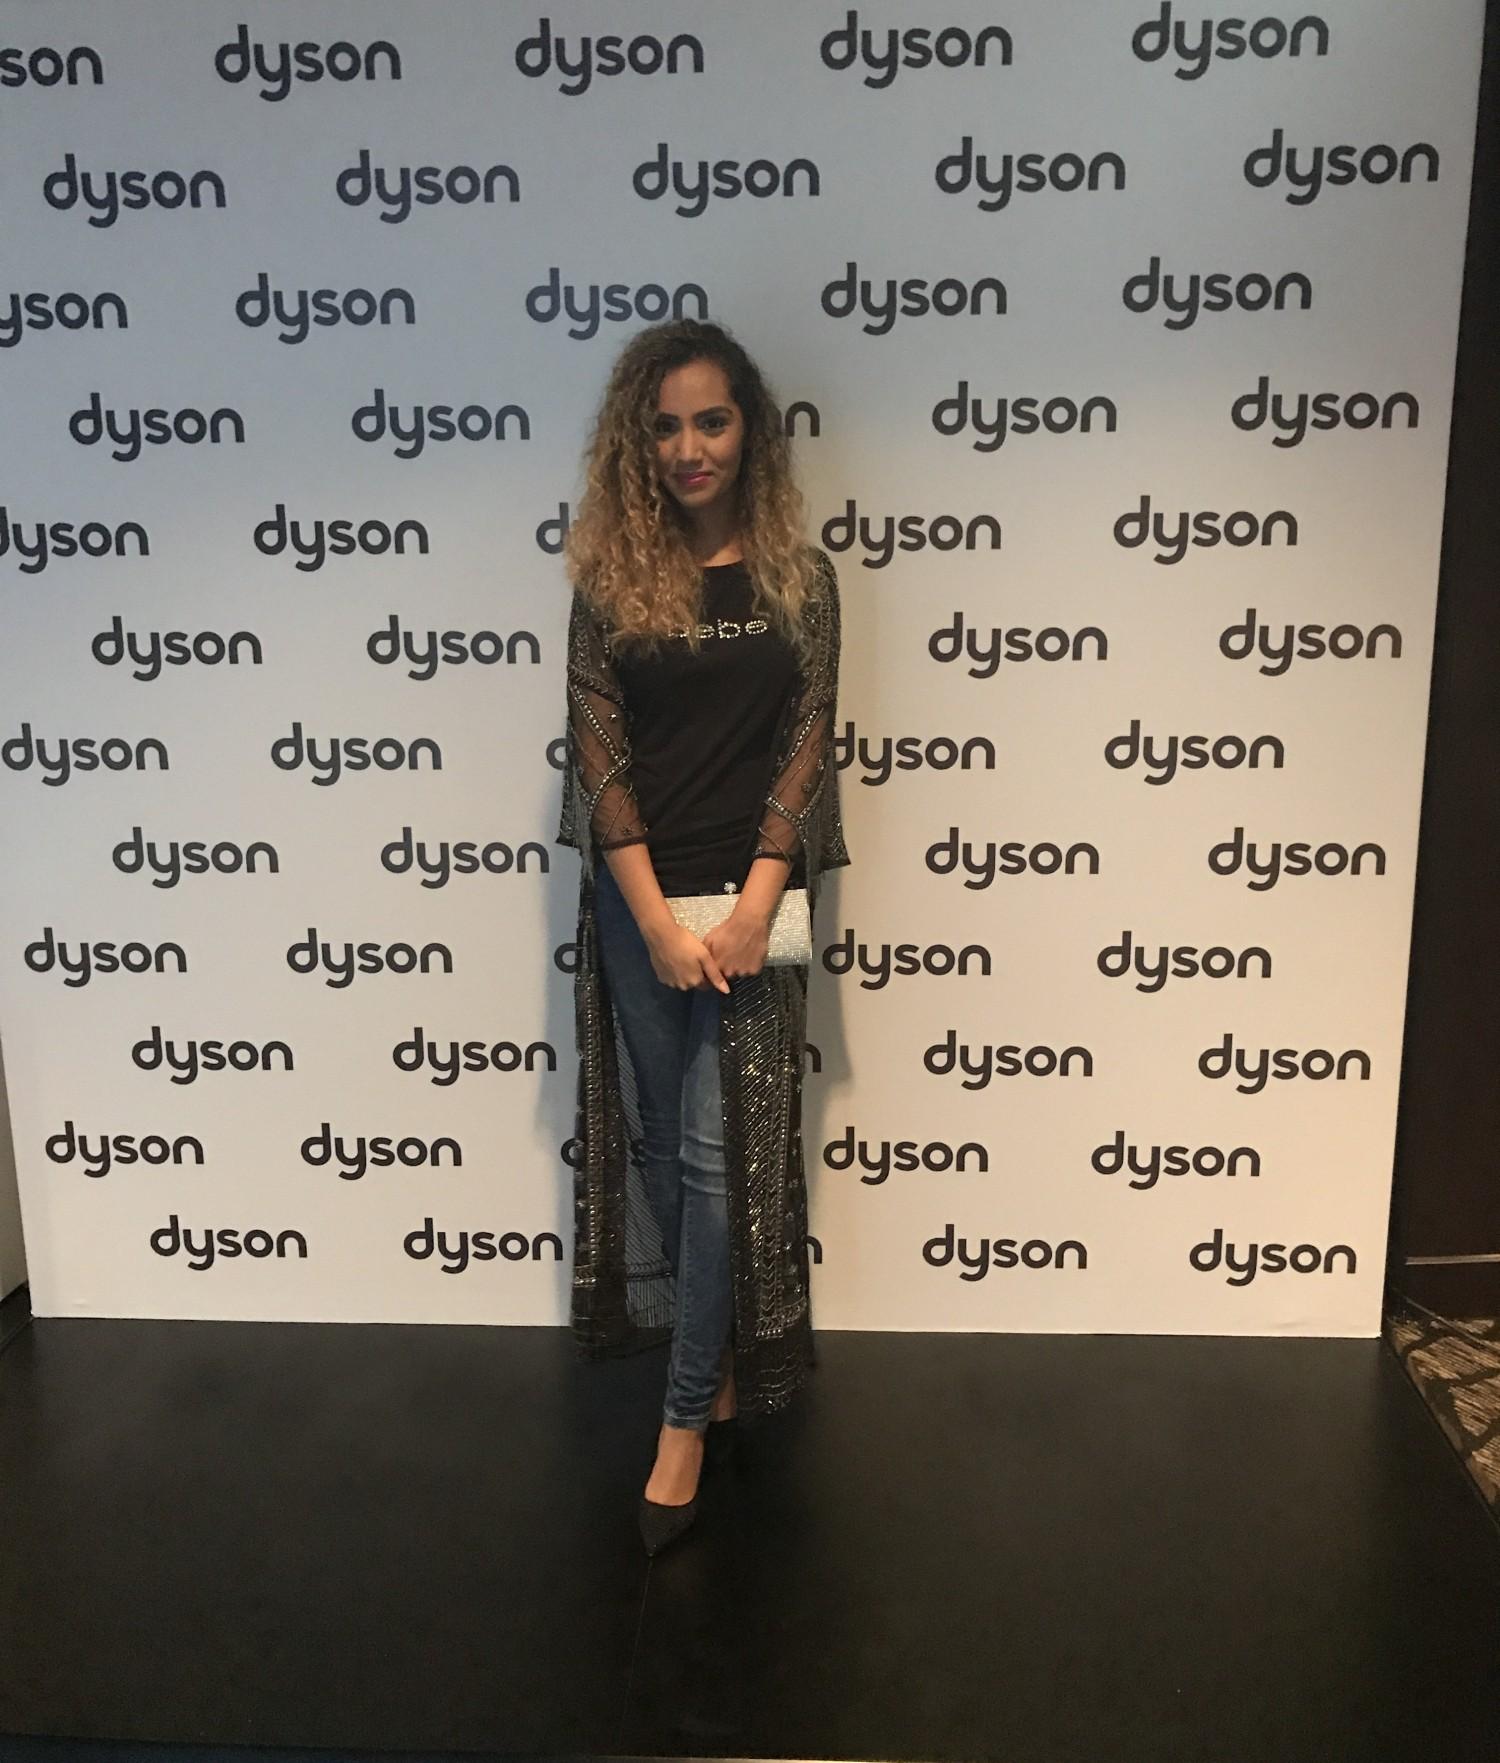 A Widespread Noxious Cool Season Annual: Dyson Demo Opens On Level 2, In The Heart Of Dubai Mall